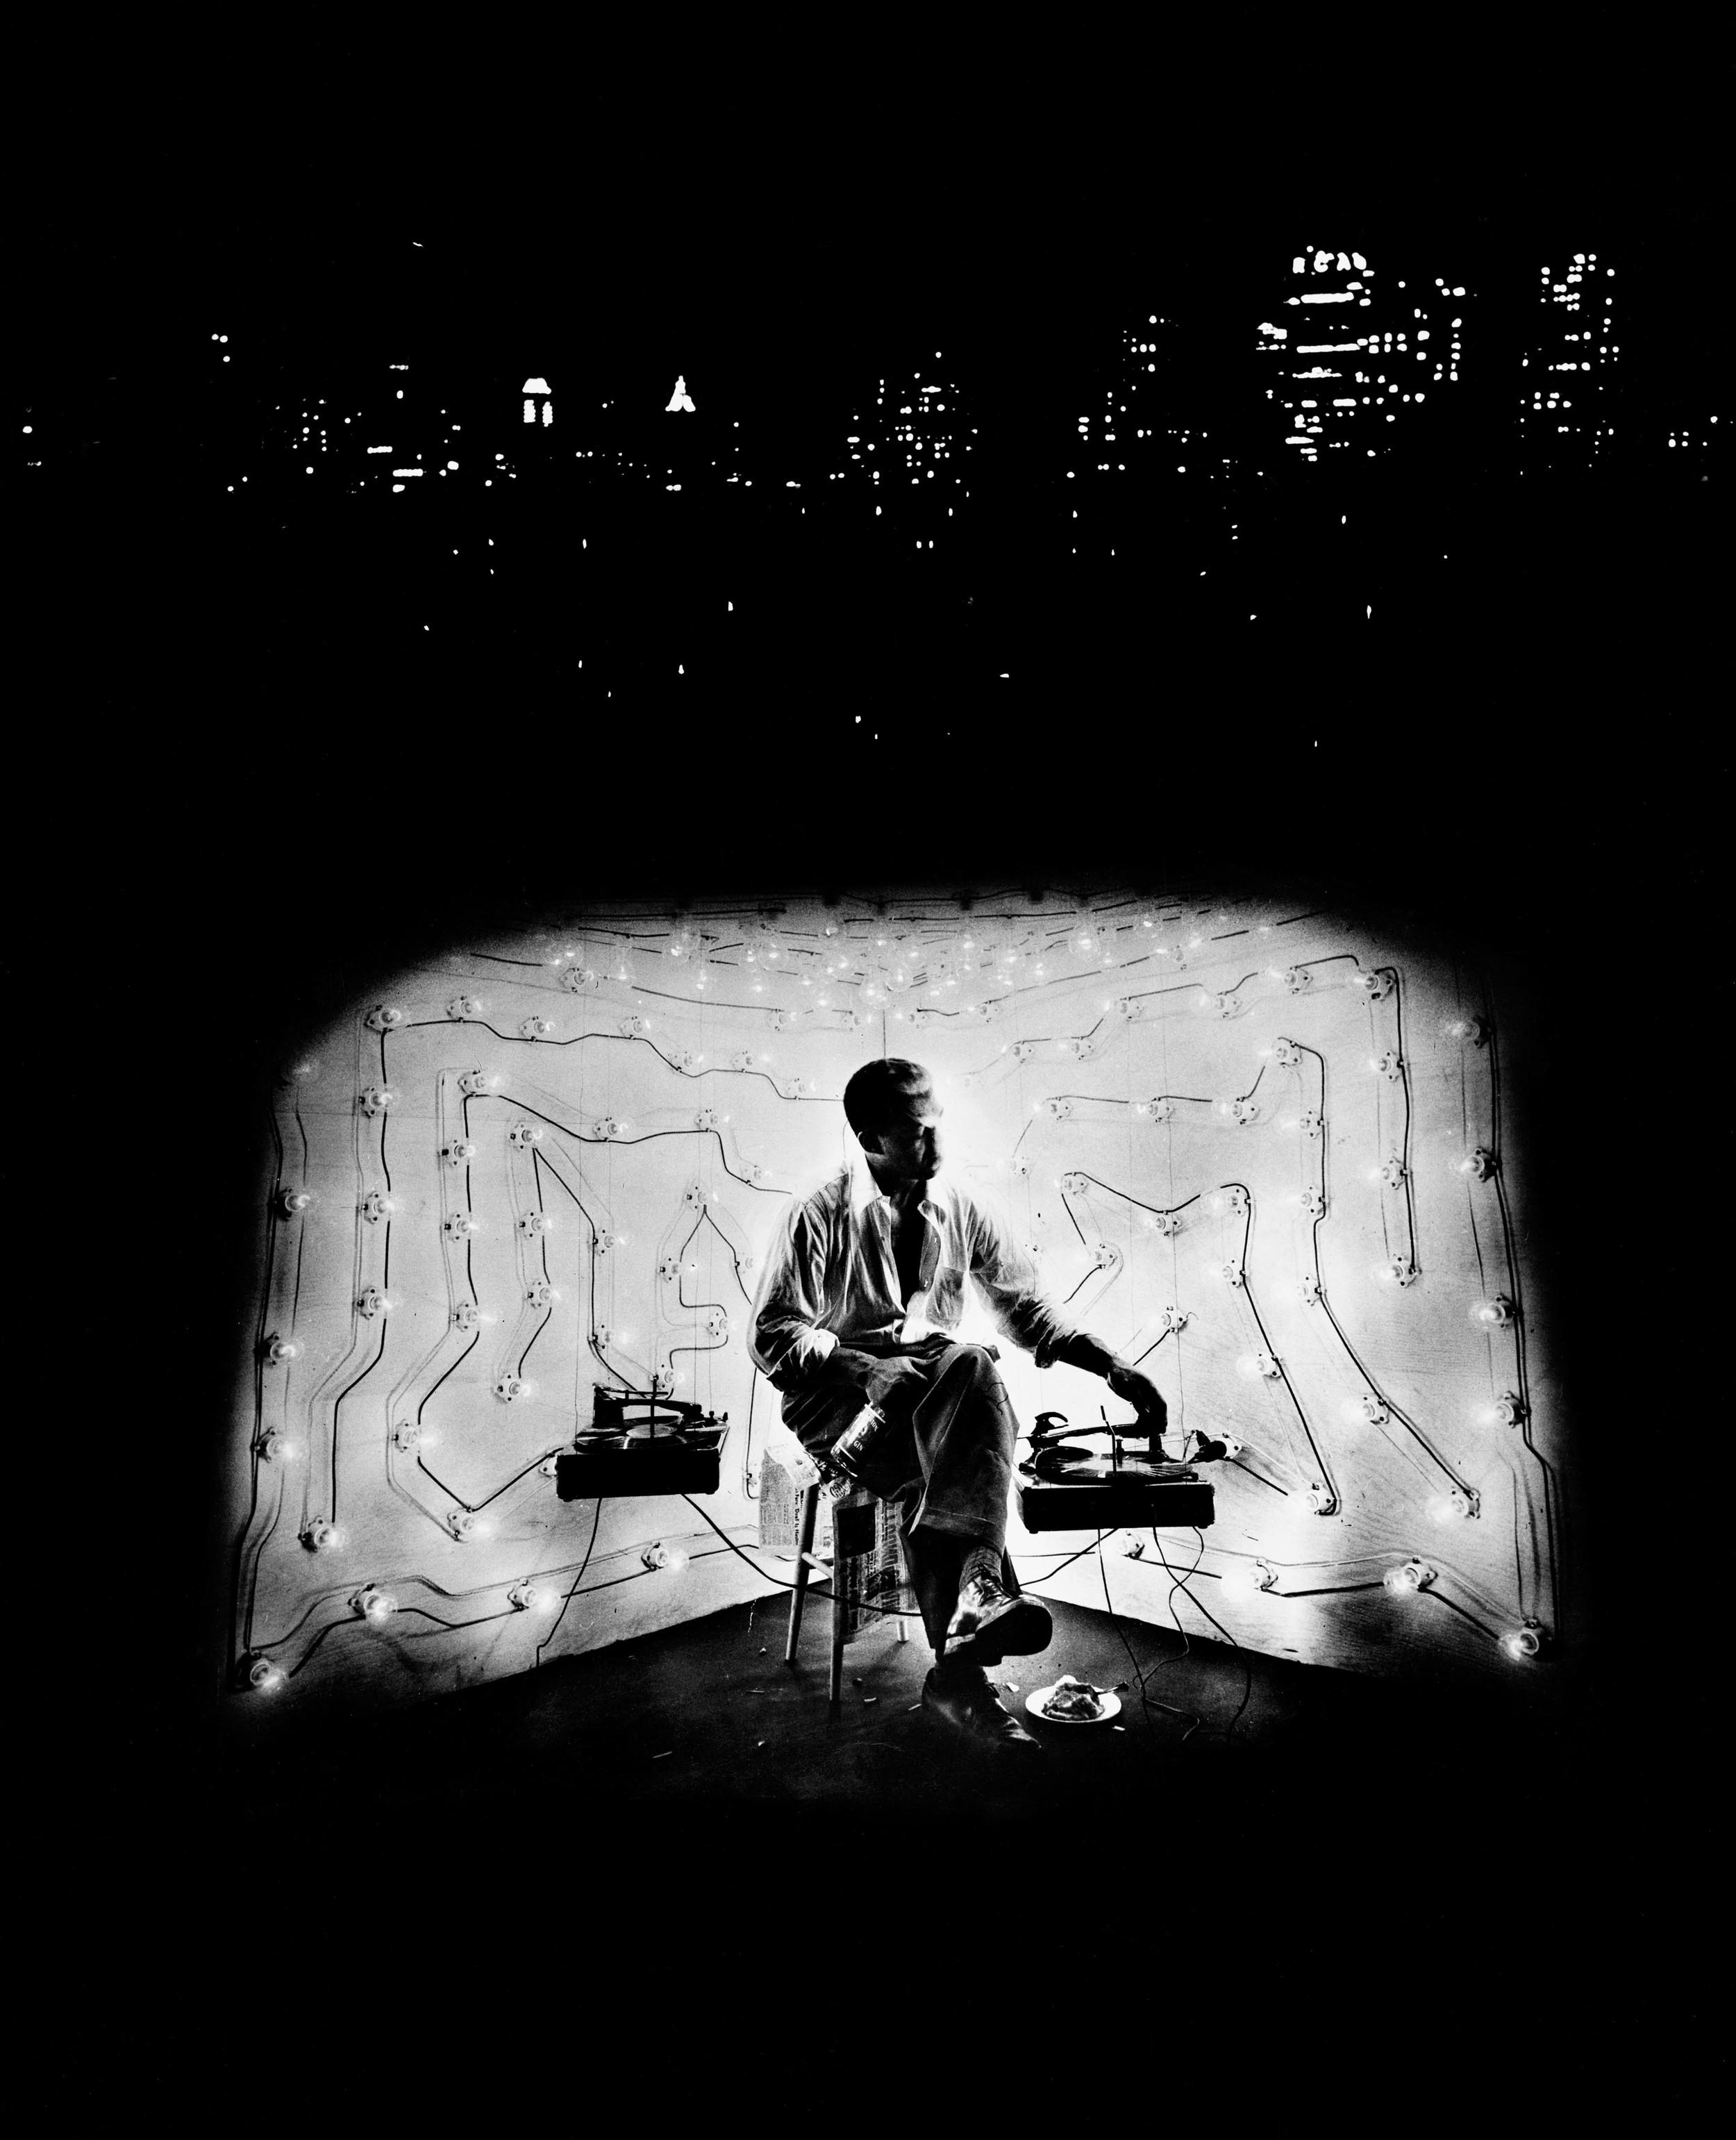 Image Above: ©The Gordon Parks Foundation. Gordon Parks, 'Invisible Man Retreat,' Harlem, New York, 1952 / Courtesy of The Gordon Parks Foundation/The Art Institute of Chicago/Steidl